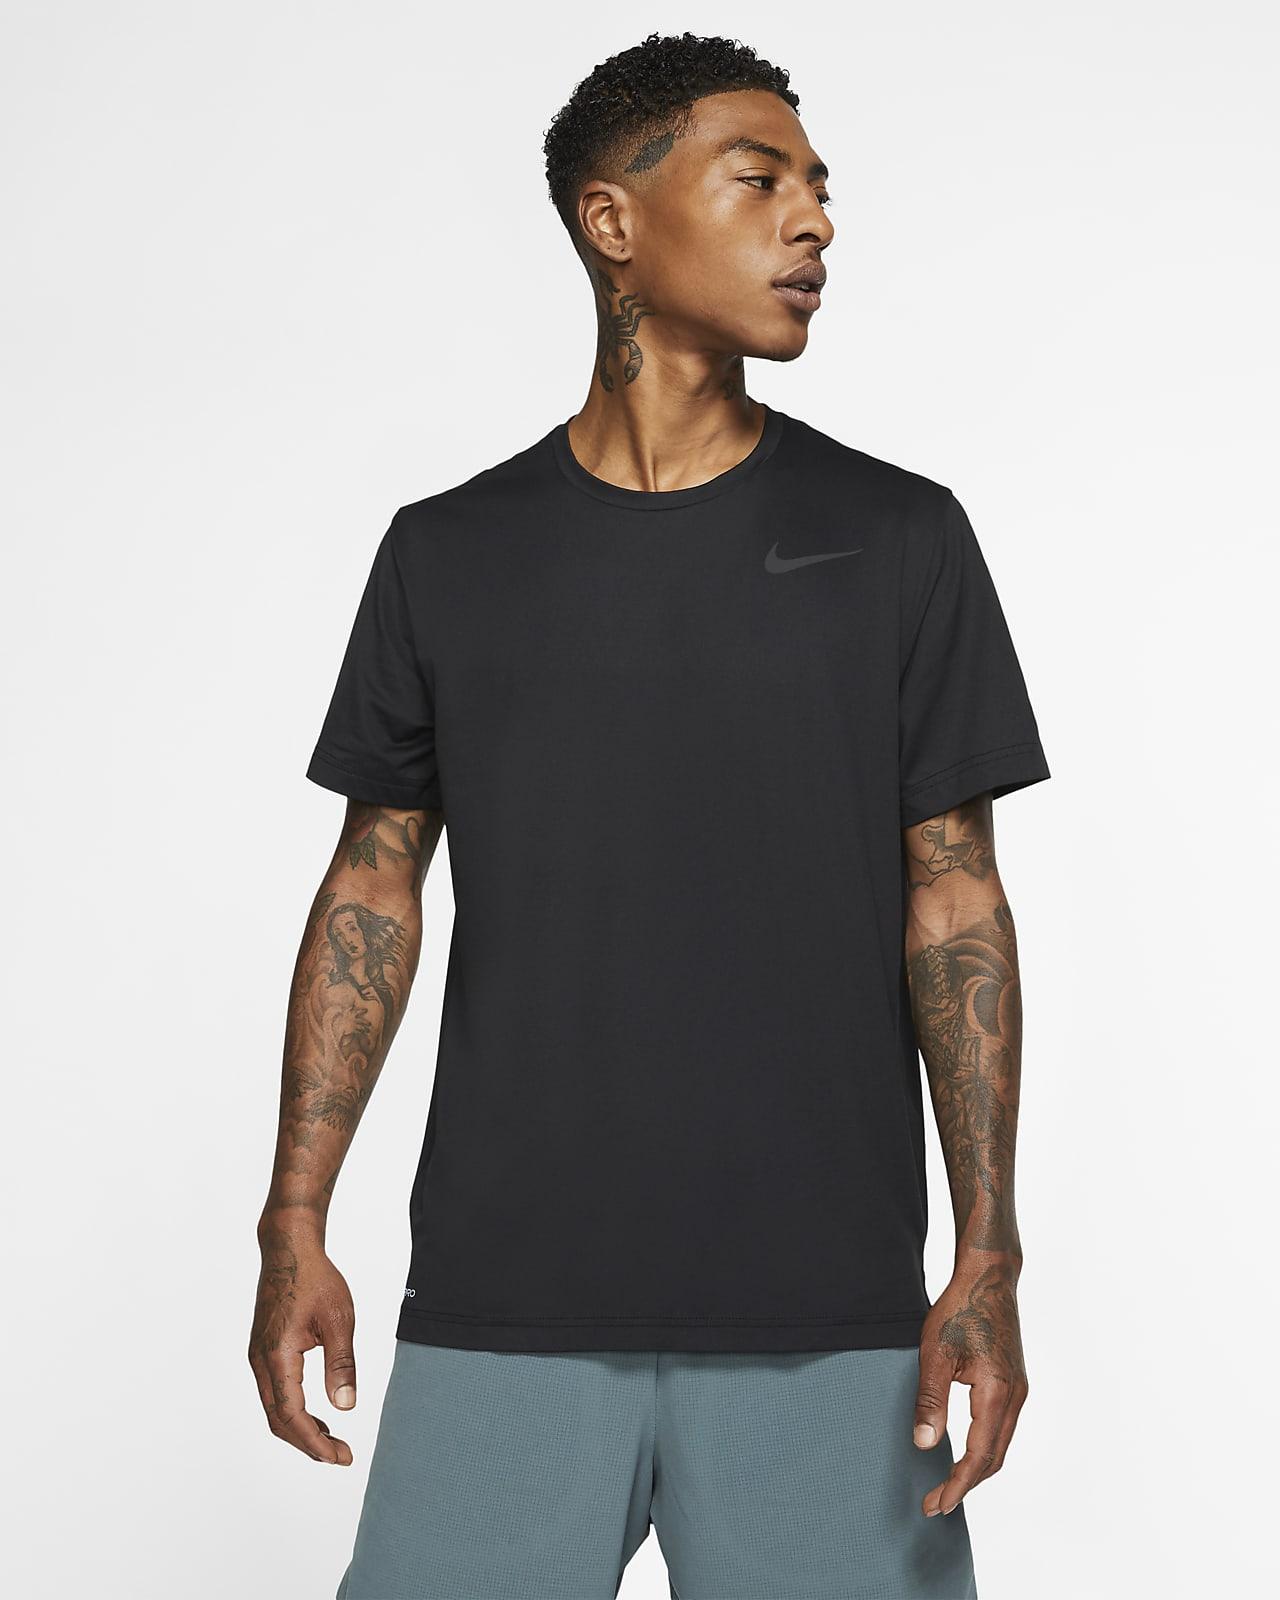 Nike Pro Kısa Kollu Erkek Üstü